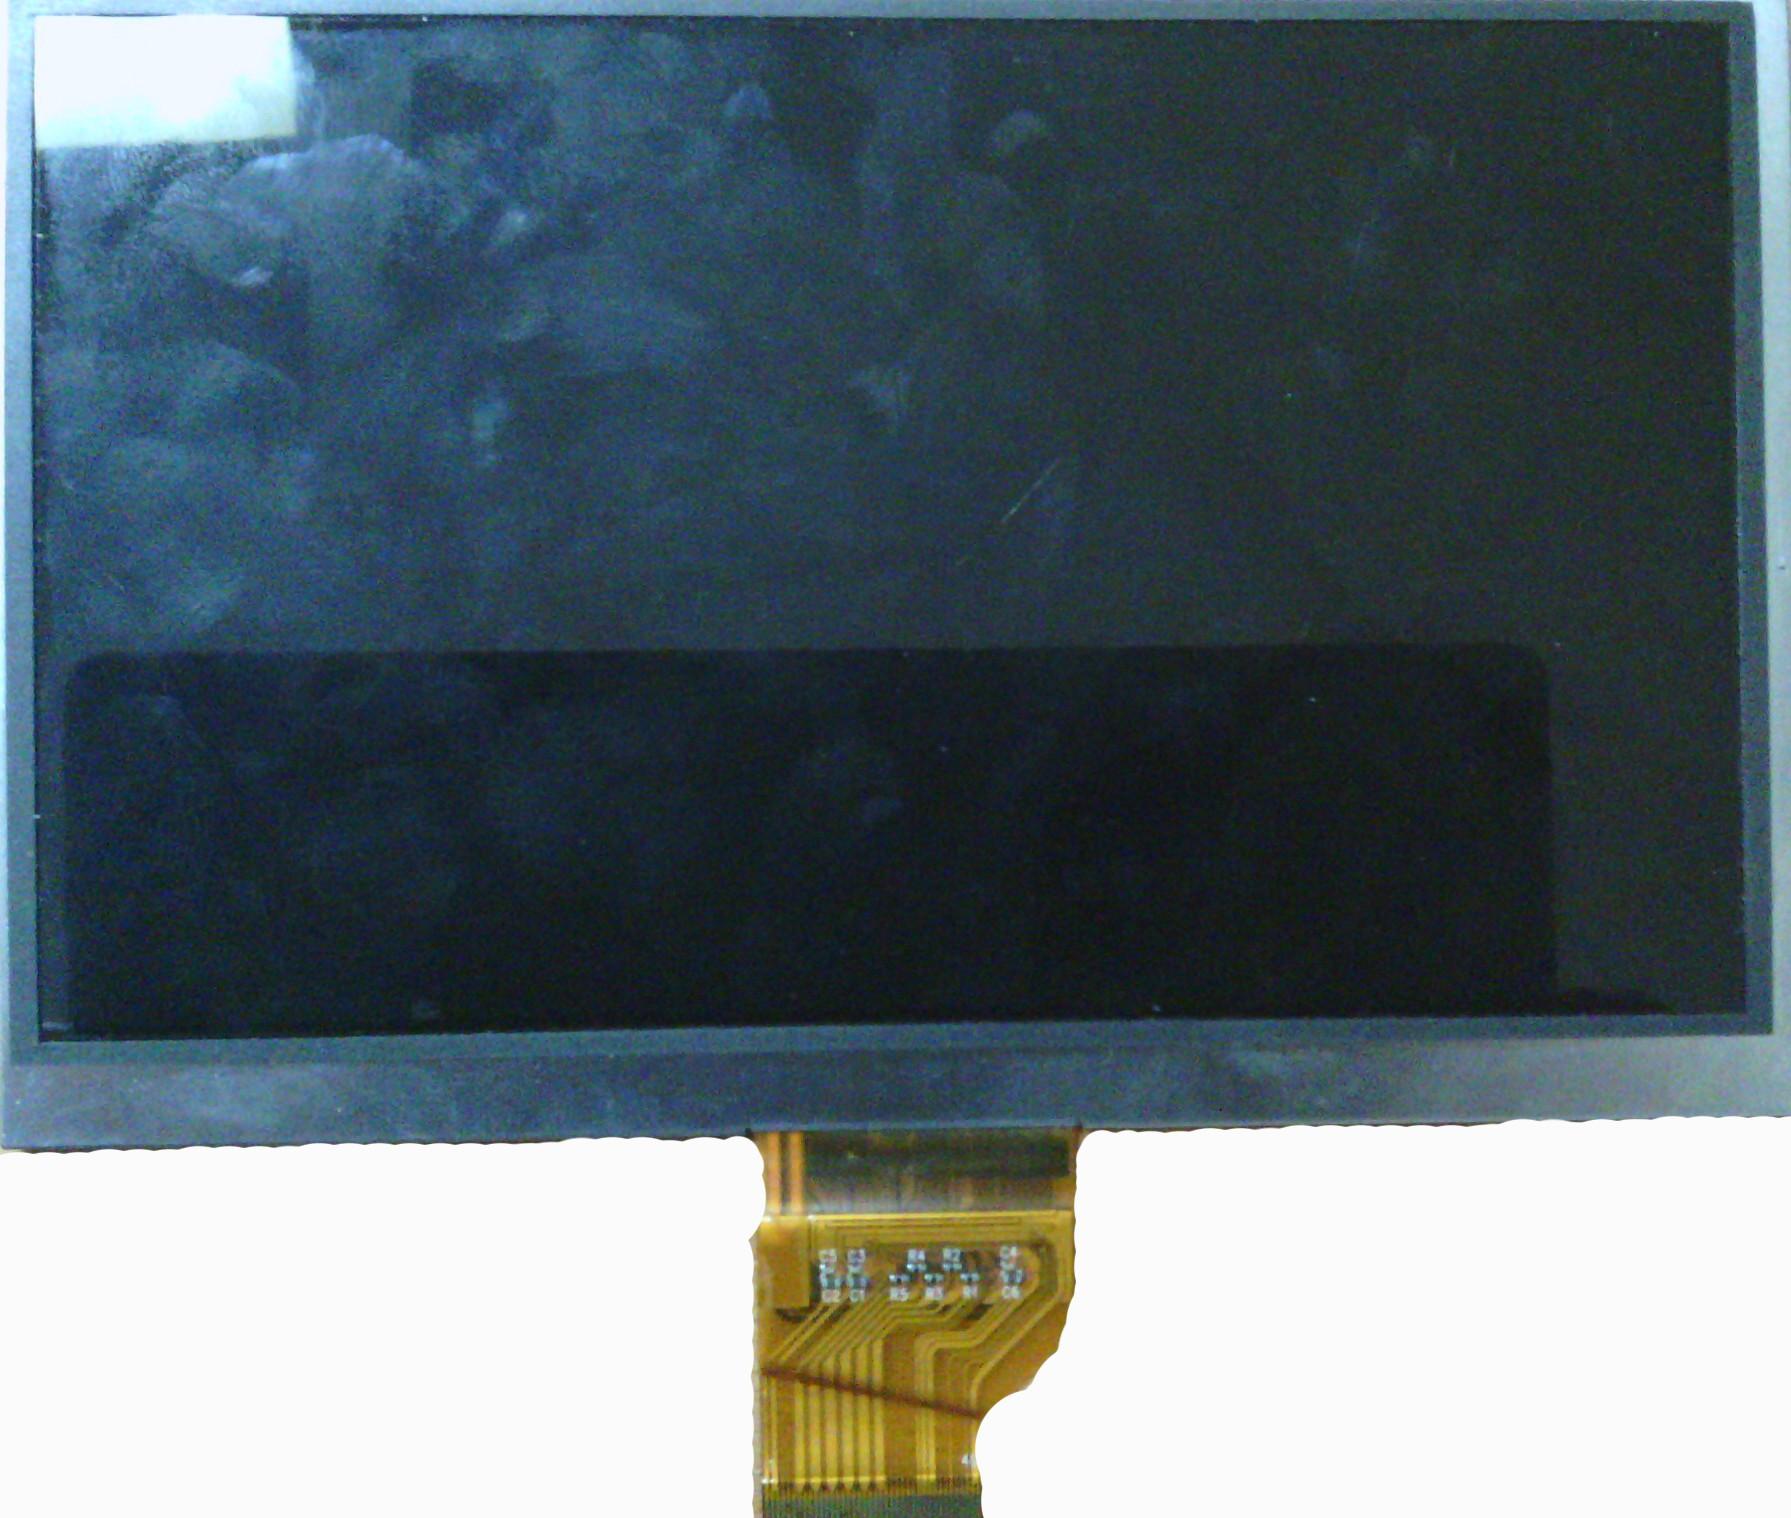 Купить Acer Iconia Tab W4821 grey в Москве цена планшета